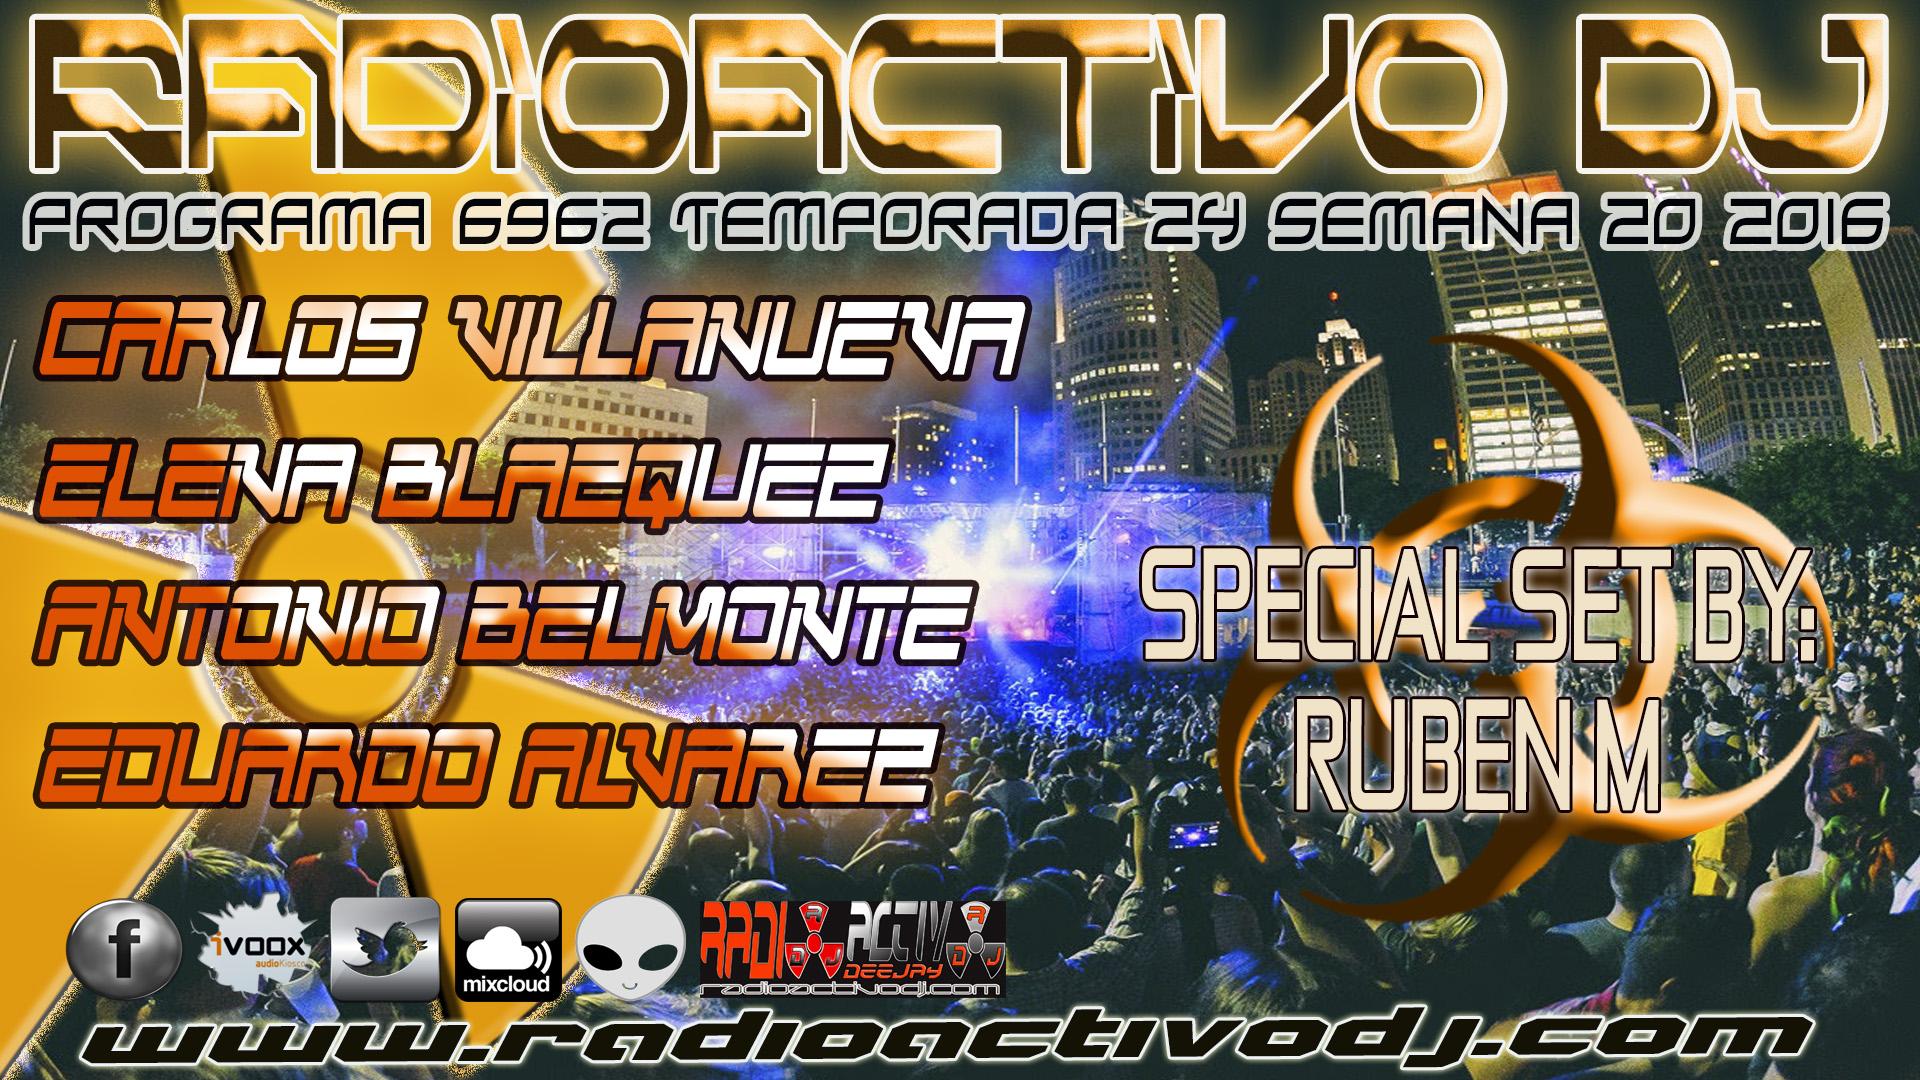 RADIOACTIVO DJ 20-2016